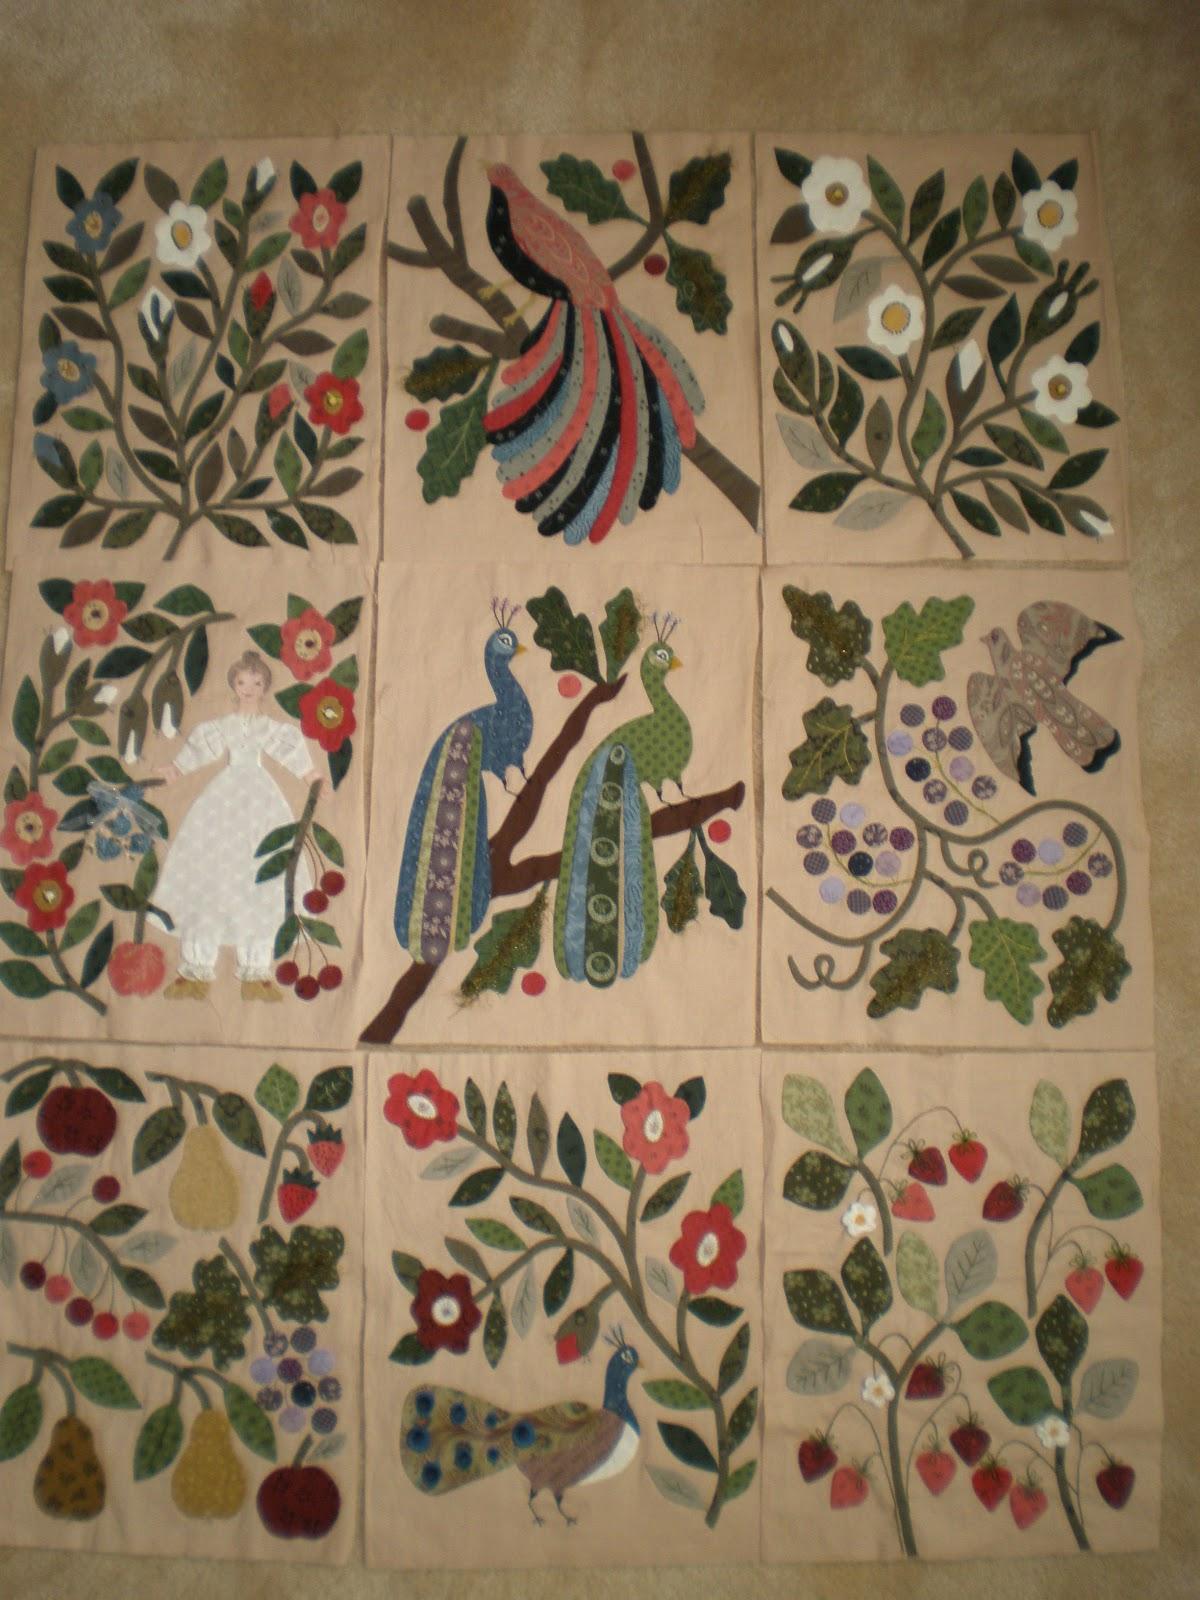 Sew Many Joyous Things Linda S Journey Block 10